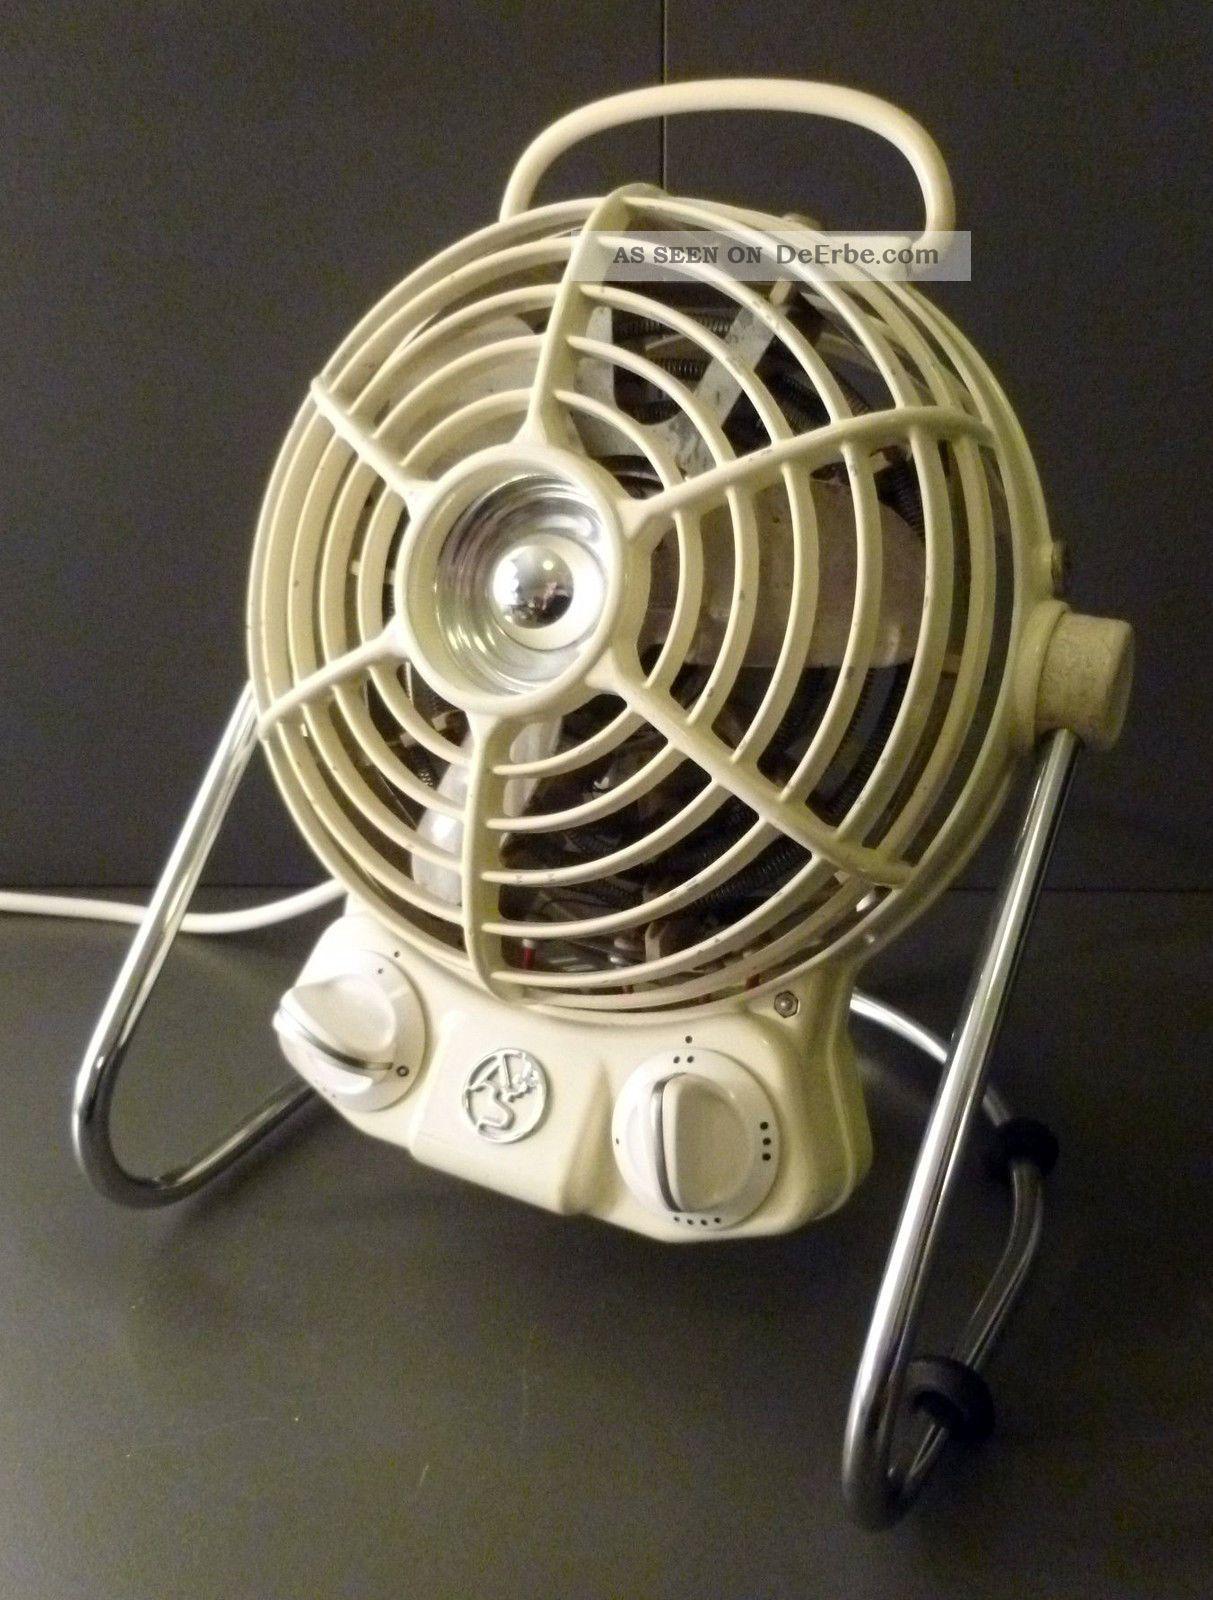 bauhaus ventilator heizl fter hei luftgebl se as albin. Black Bedroom Furniture Sets. Home Design Ideas